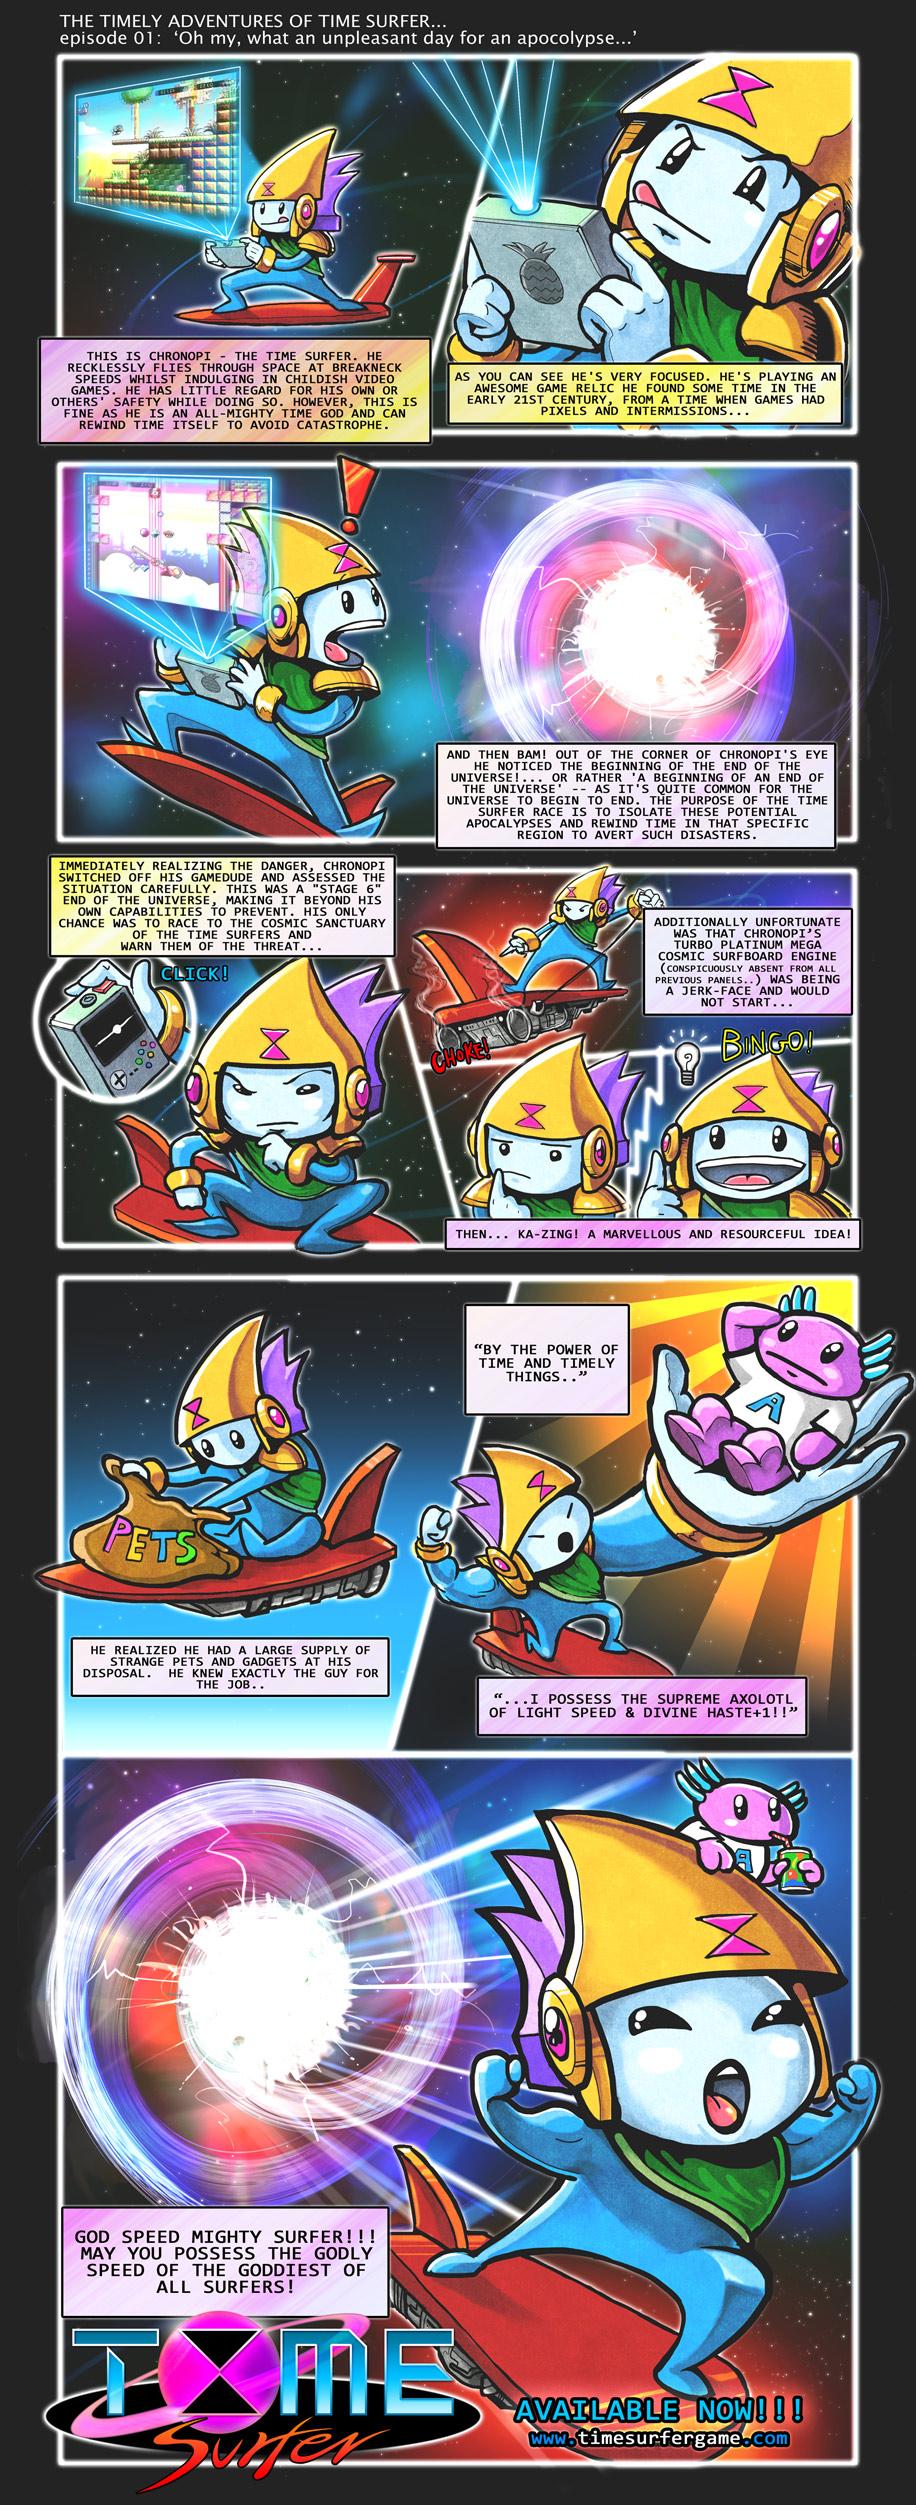 Time Surfer Comic